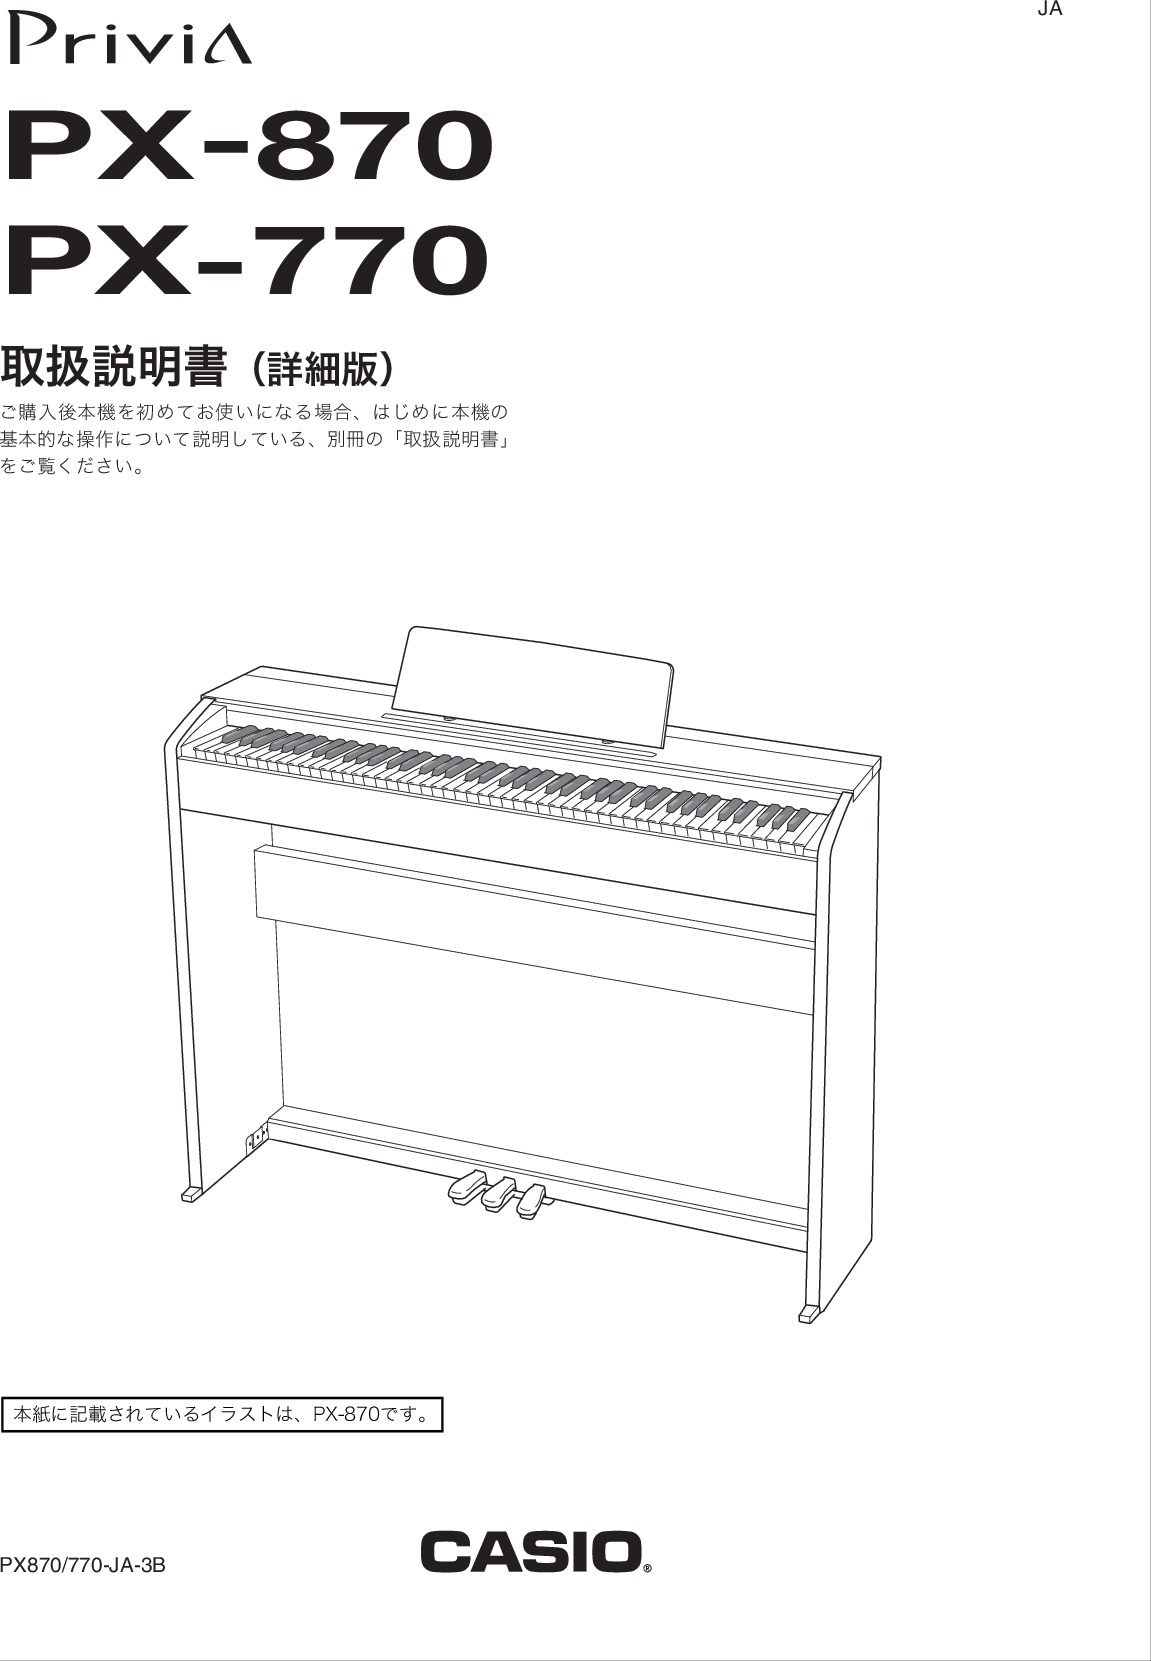 Casio PX870/770_JA PX 770取扱説明書(詳細版) Web PX870 770 JA 3B